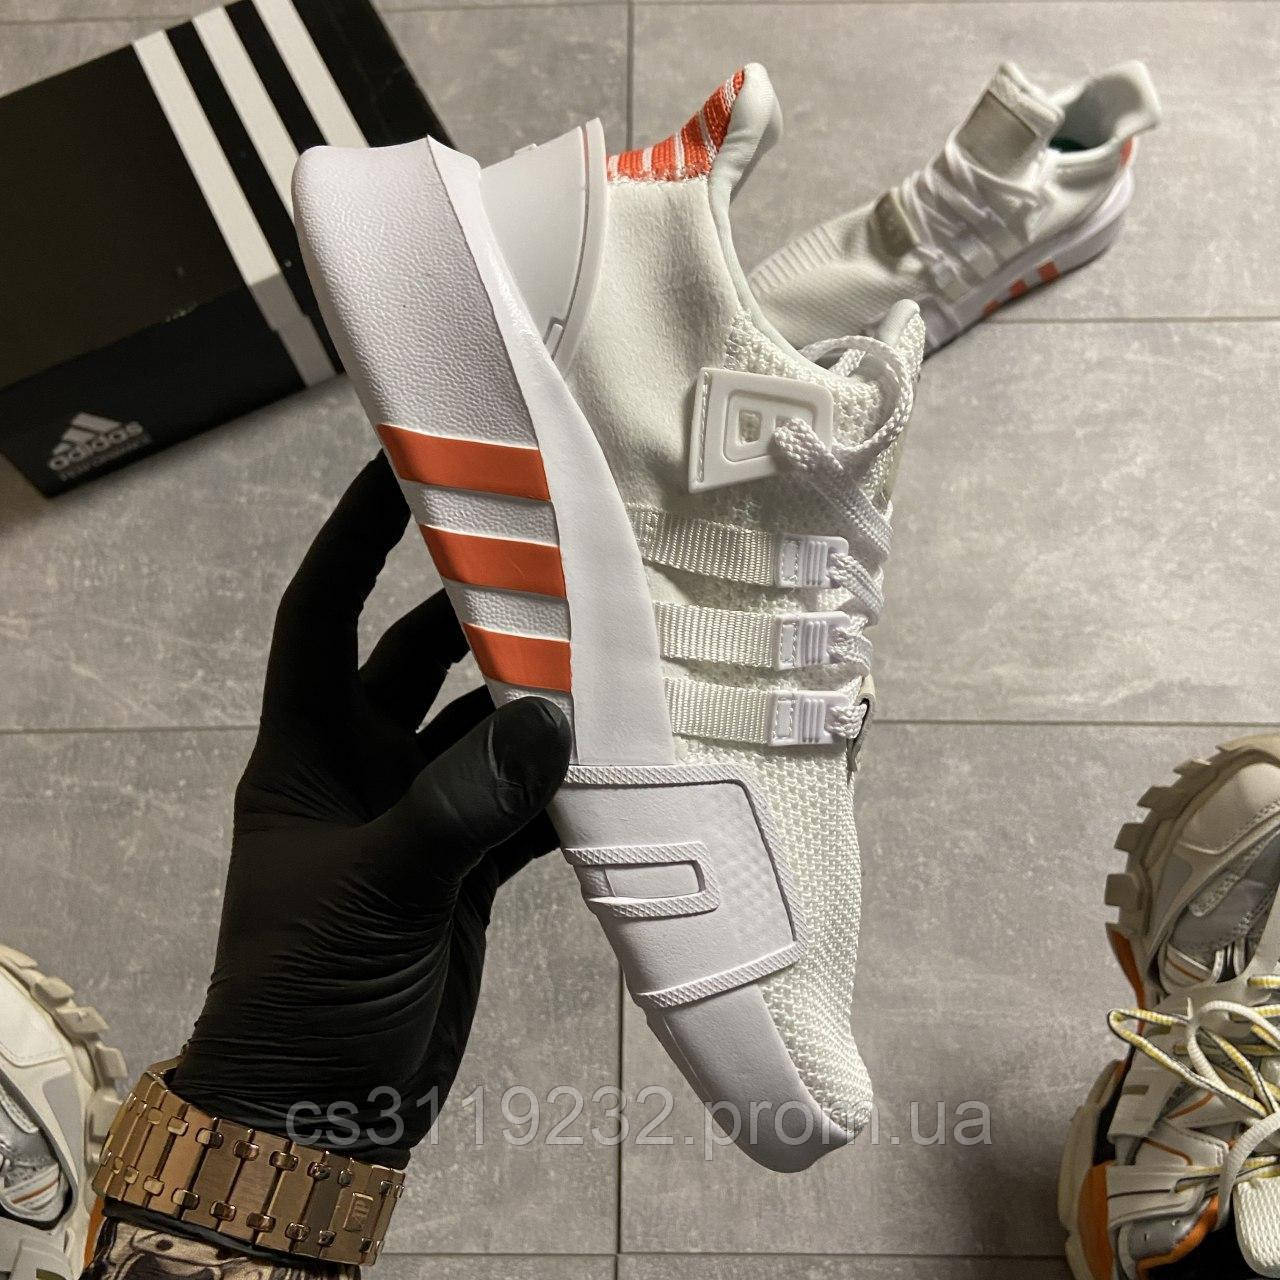 Мужские кроссовки Adidas EQT Support Bask Adv White Orange (белые)